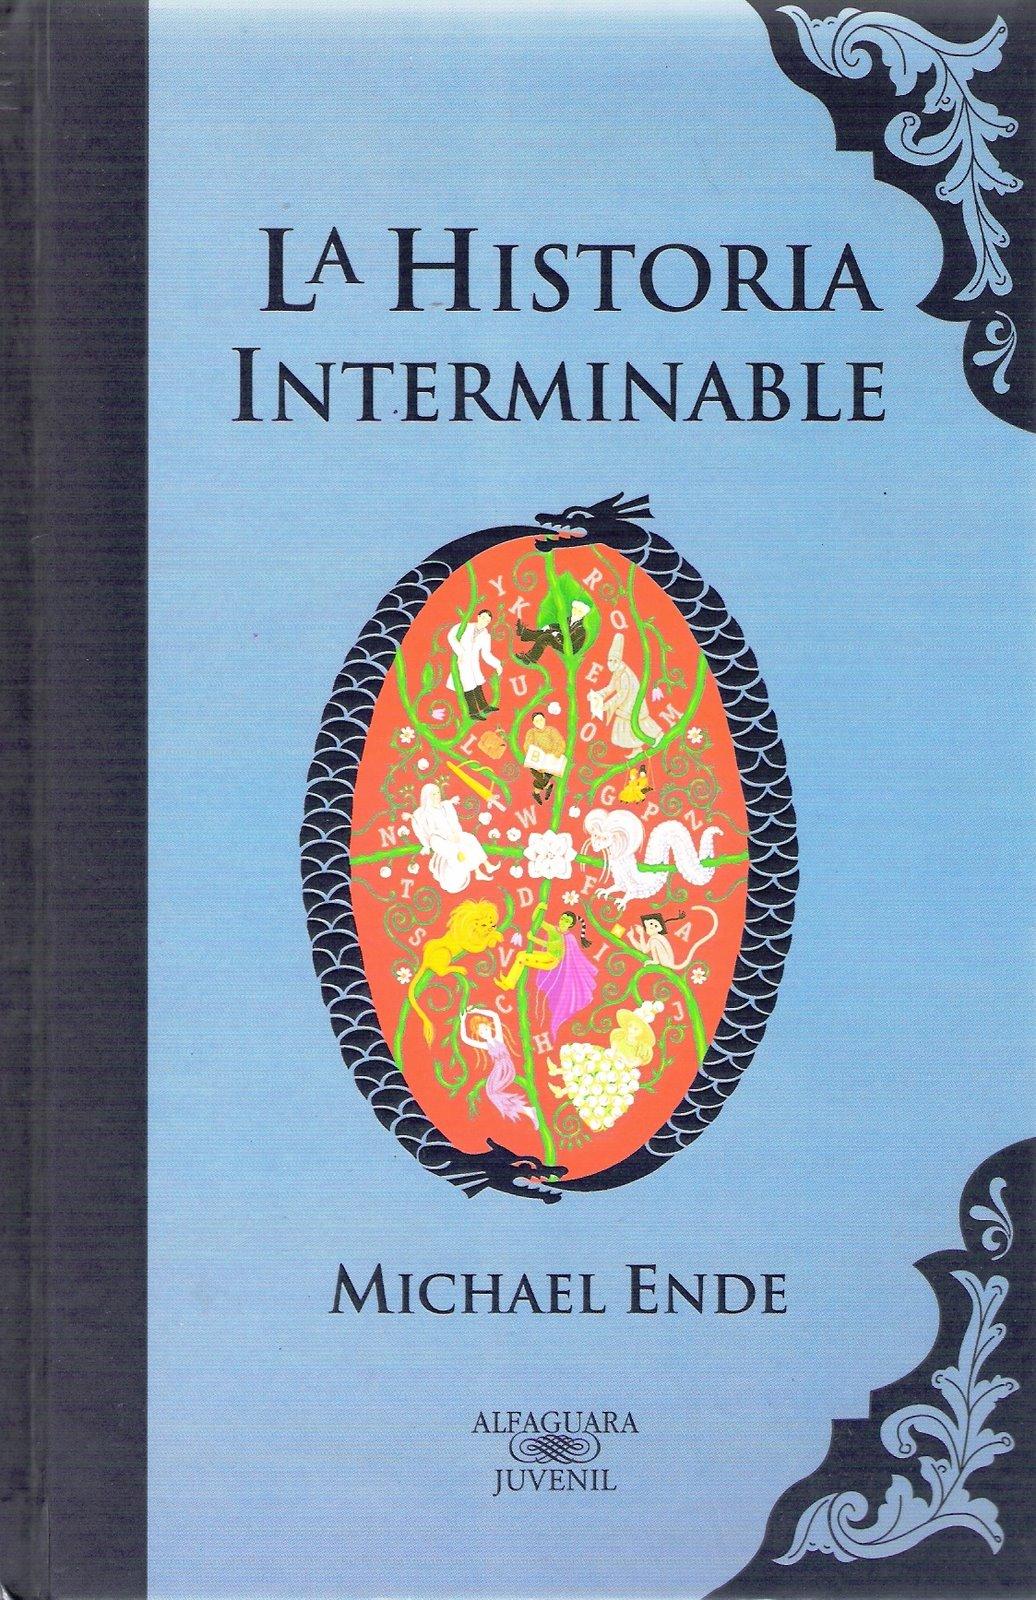 libro la historia interminable: